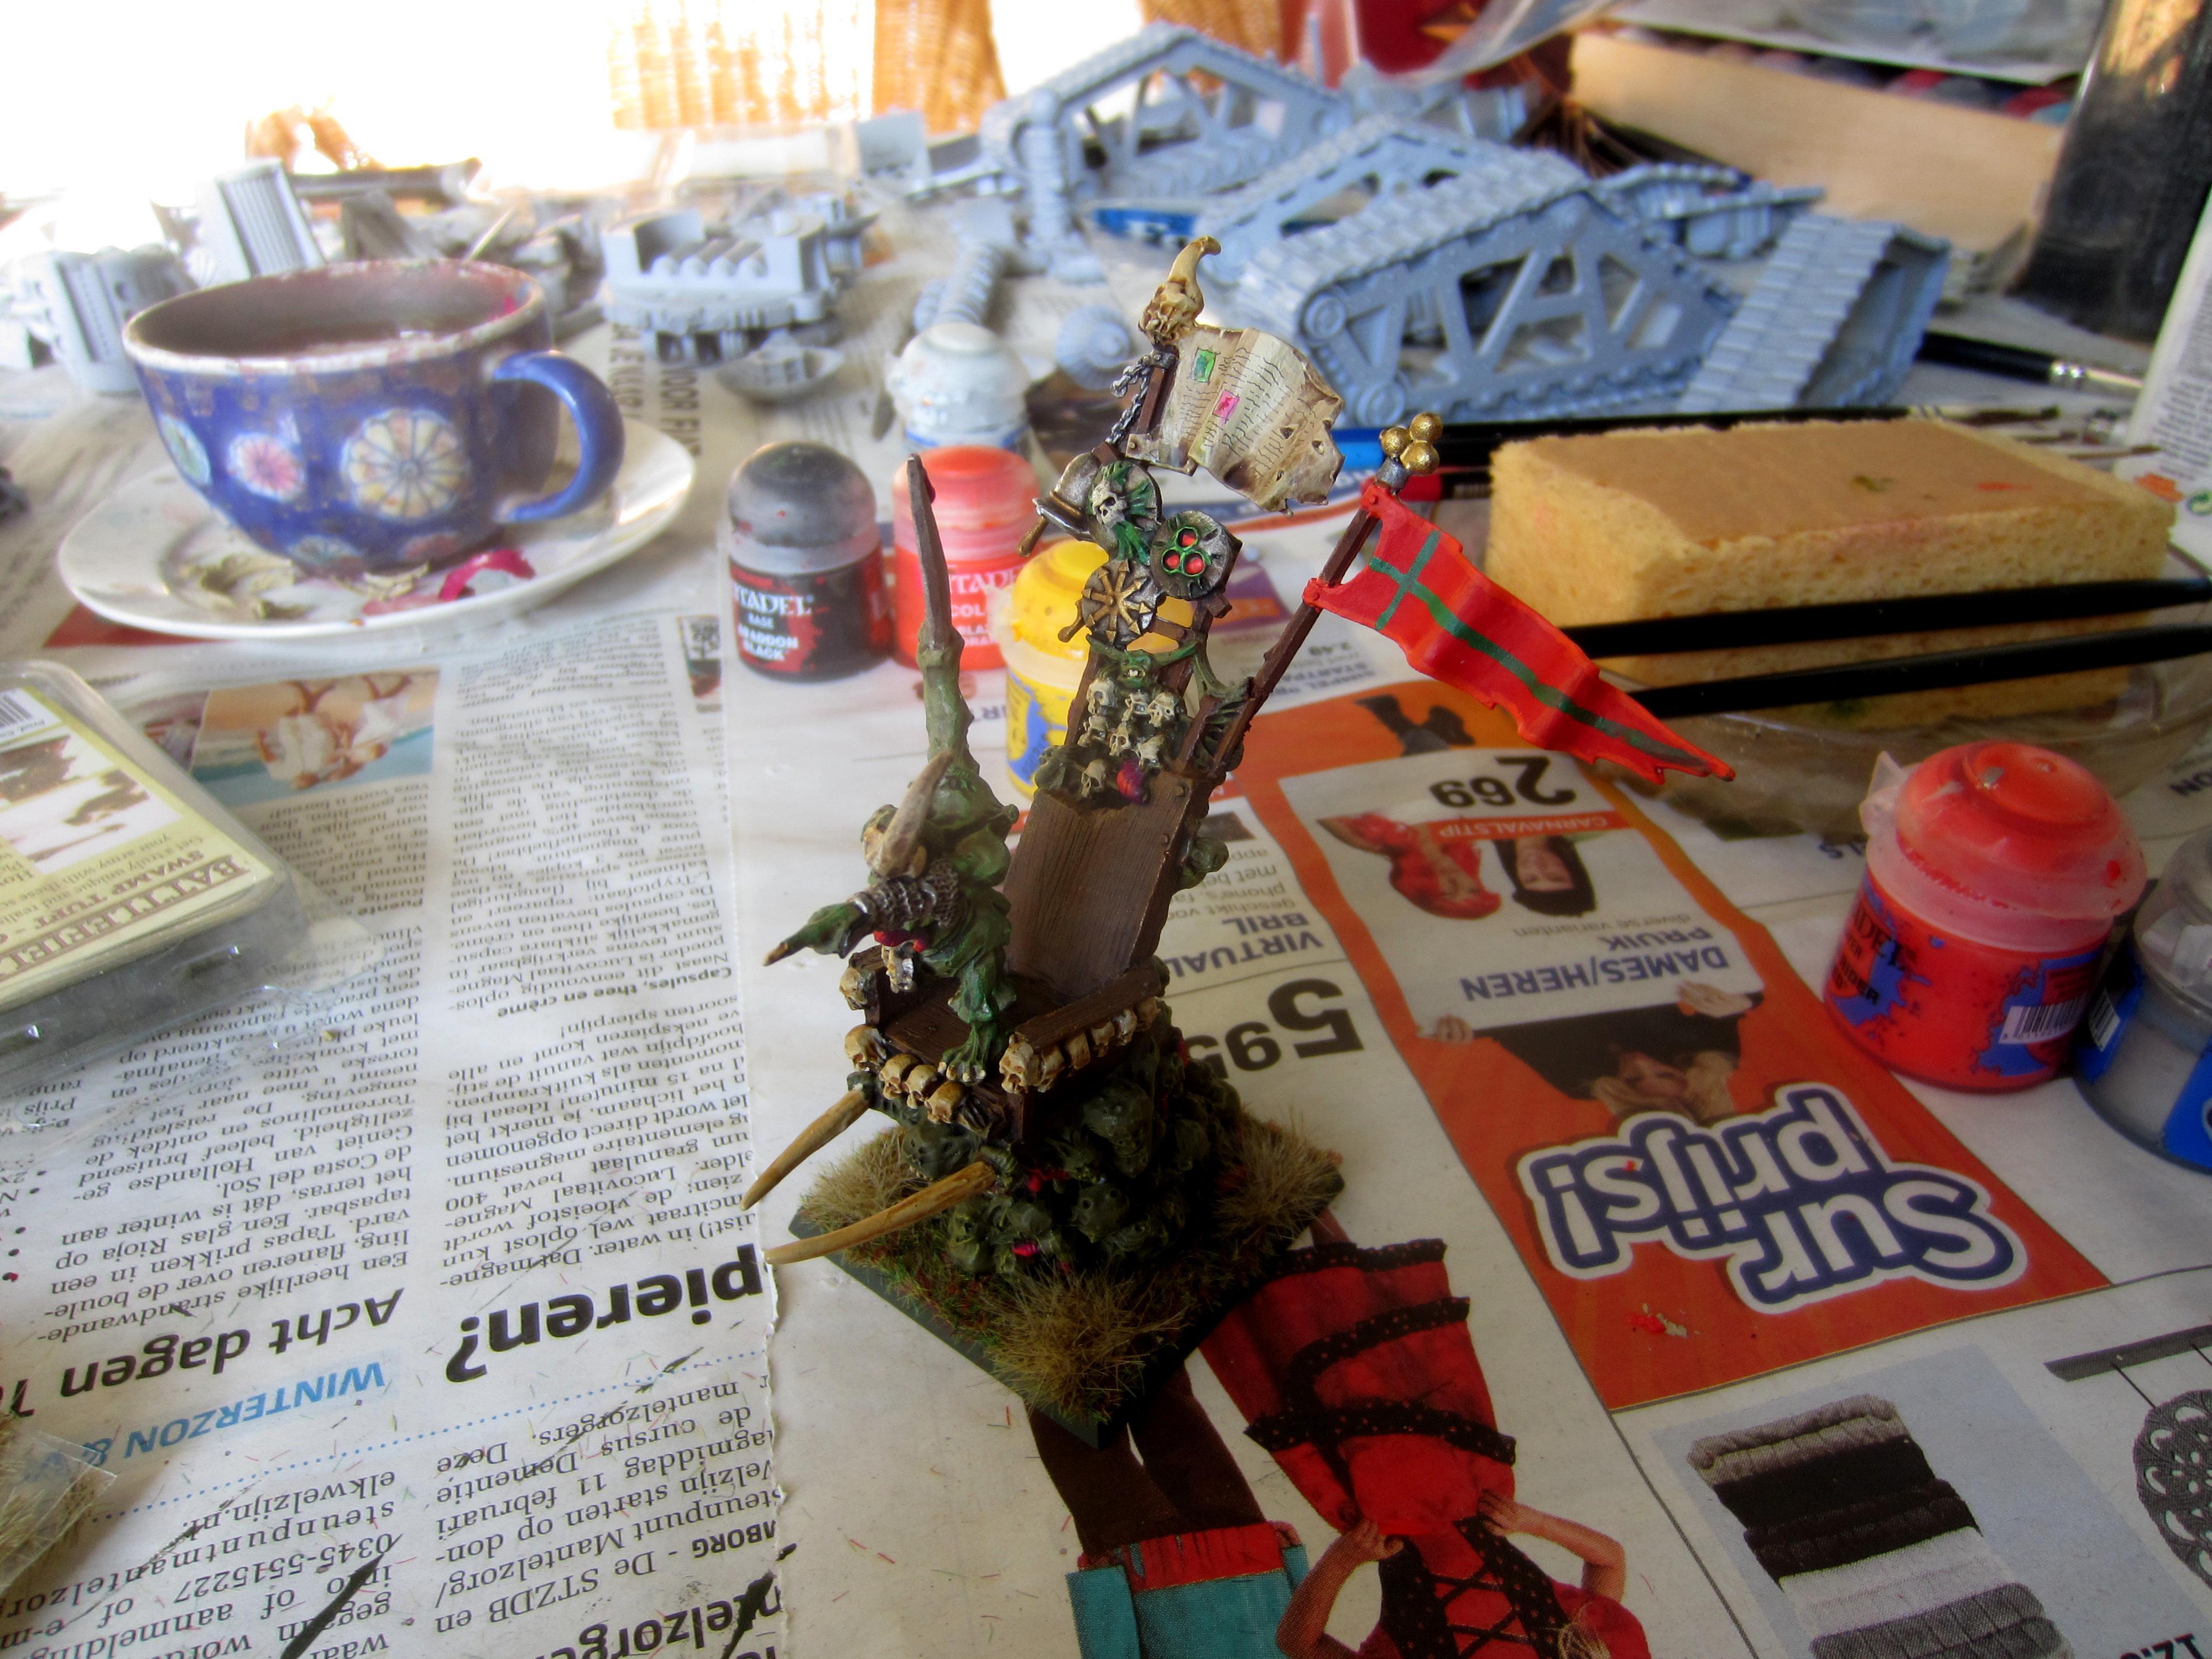 Chaos, Daemons, Herald, Nurgle, Palanquin